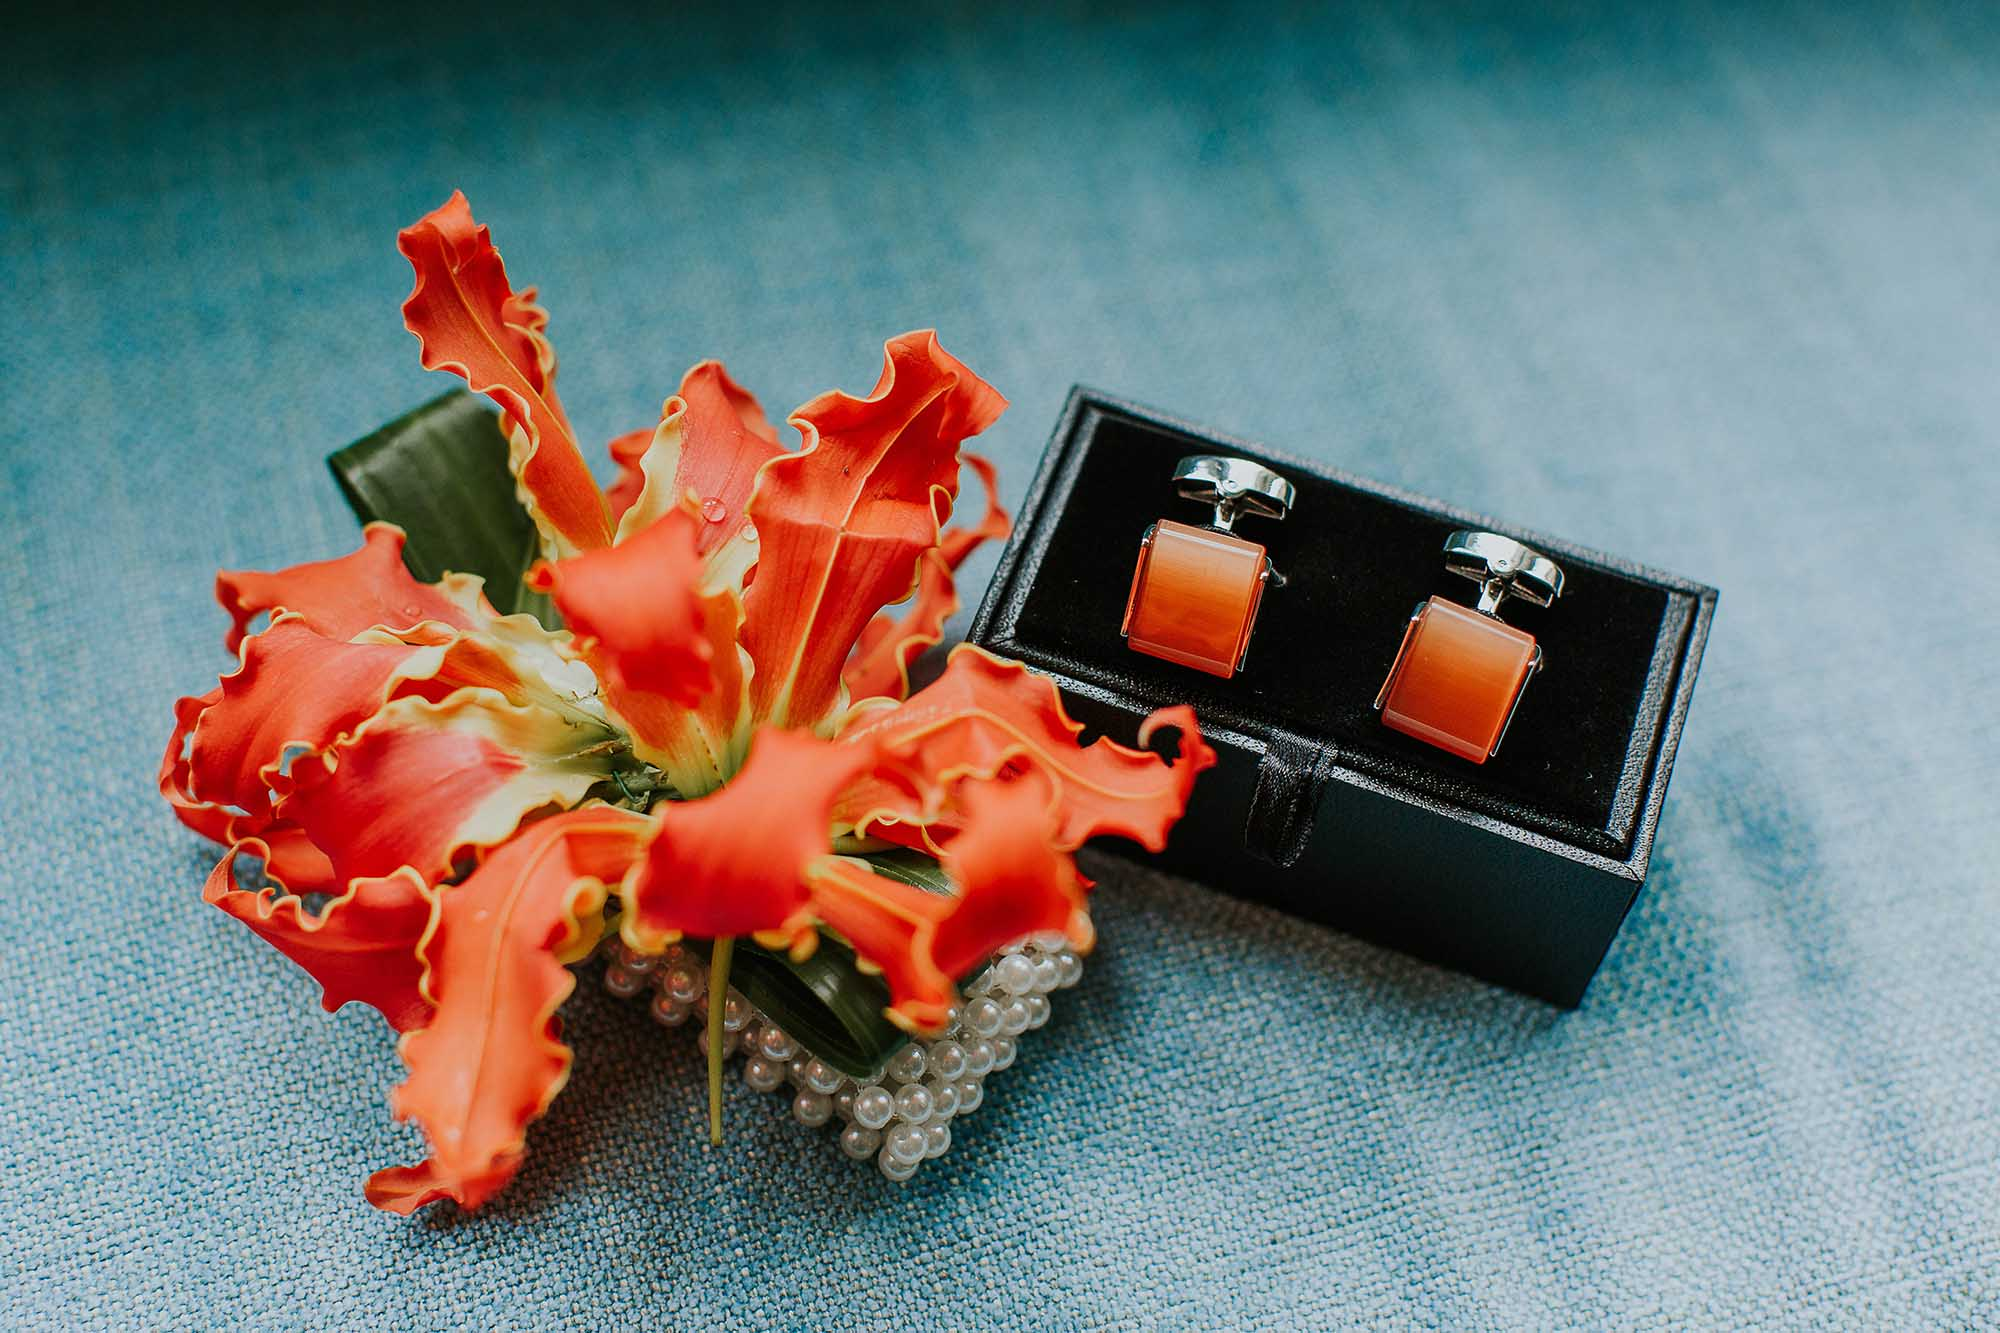 groom's orange cufflinks